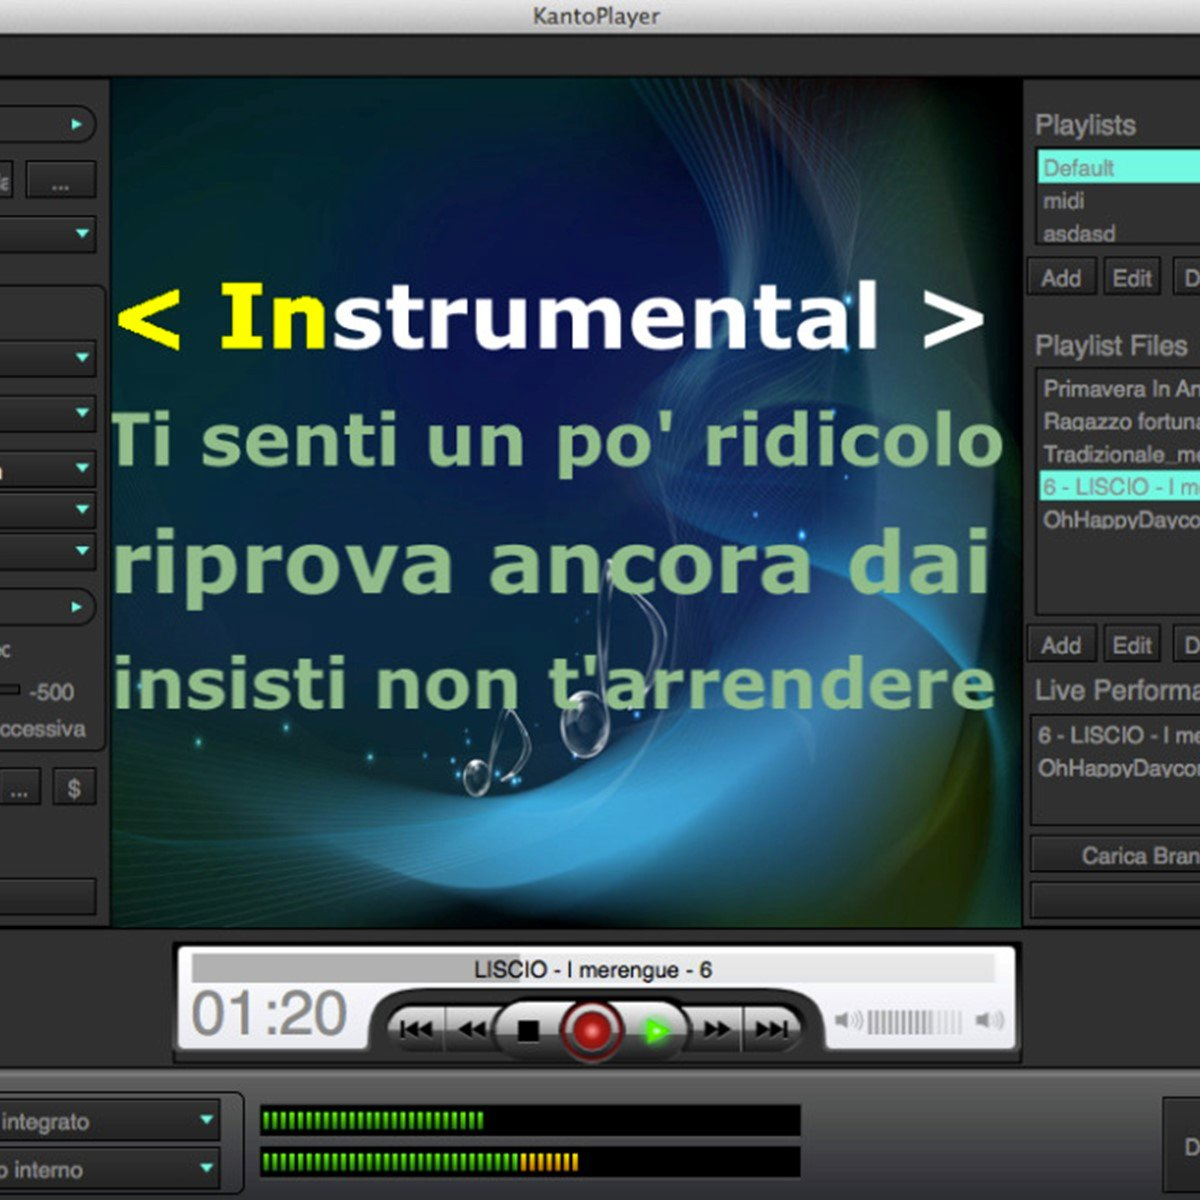 Kanto Karaoke Player For Mac Alternatives And Similar